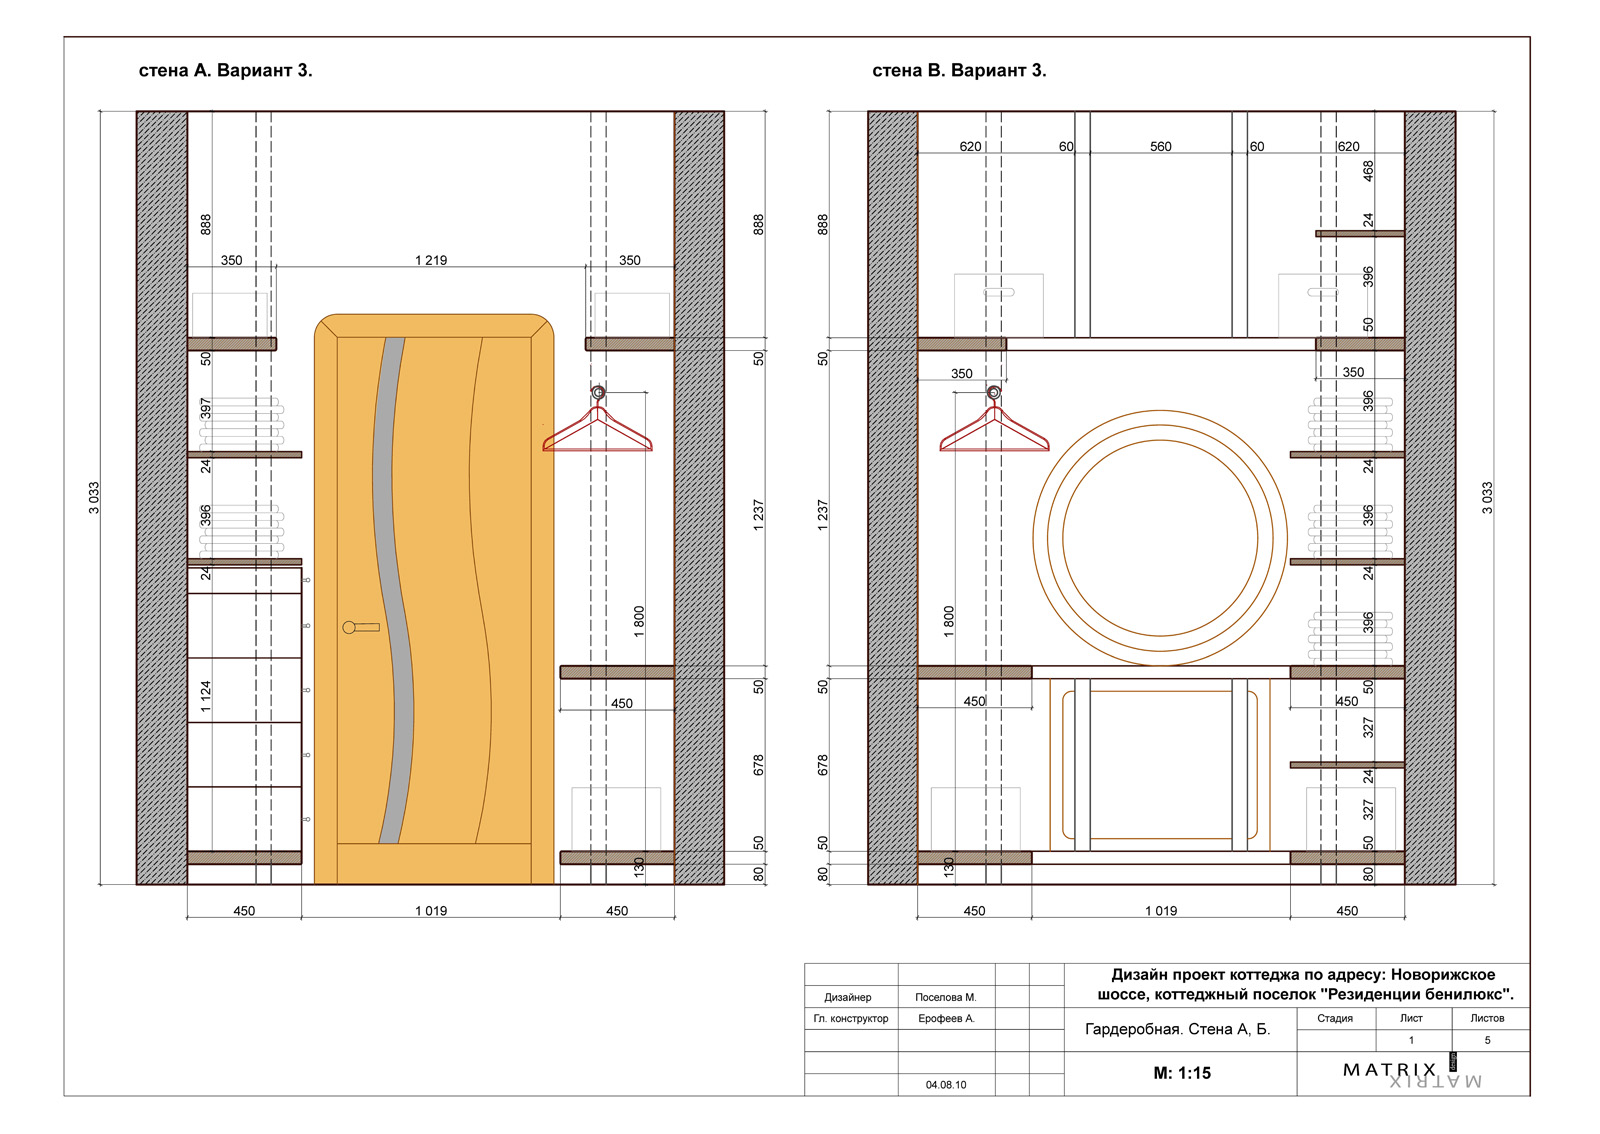 Гардеробная комната планировка с размерами своими руками